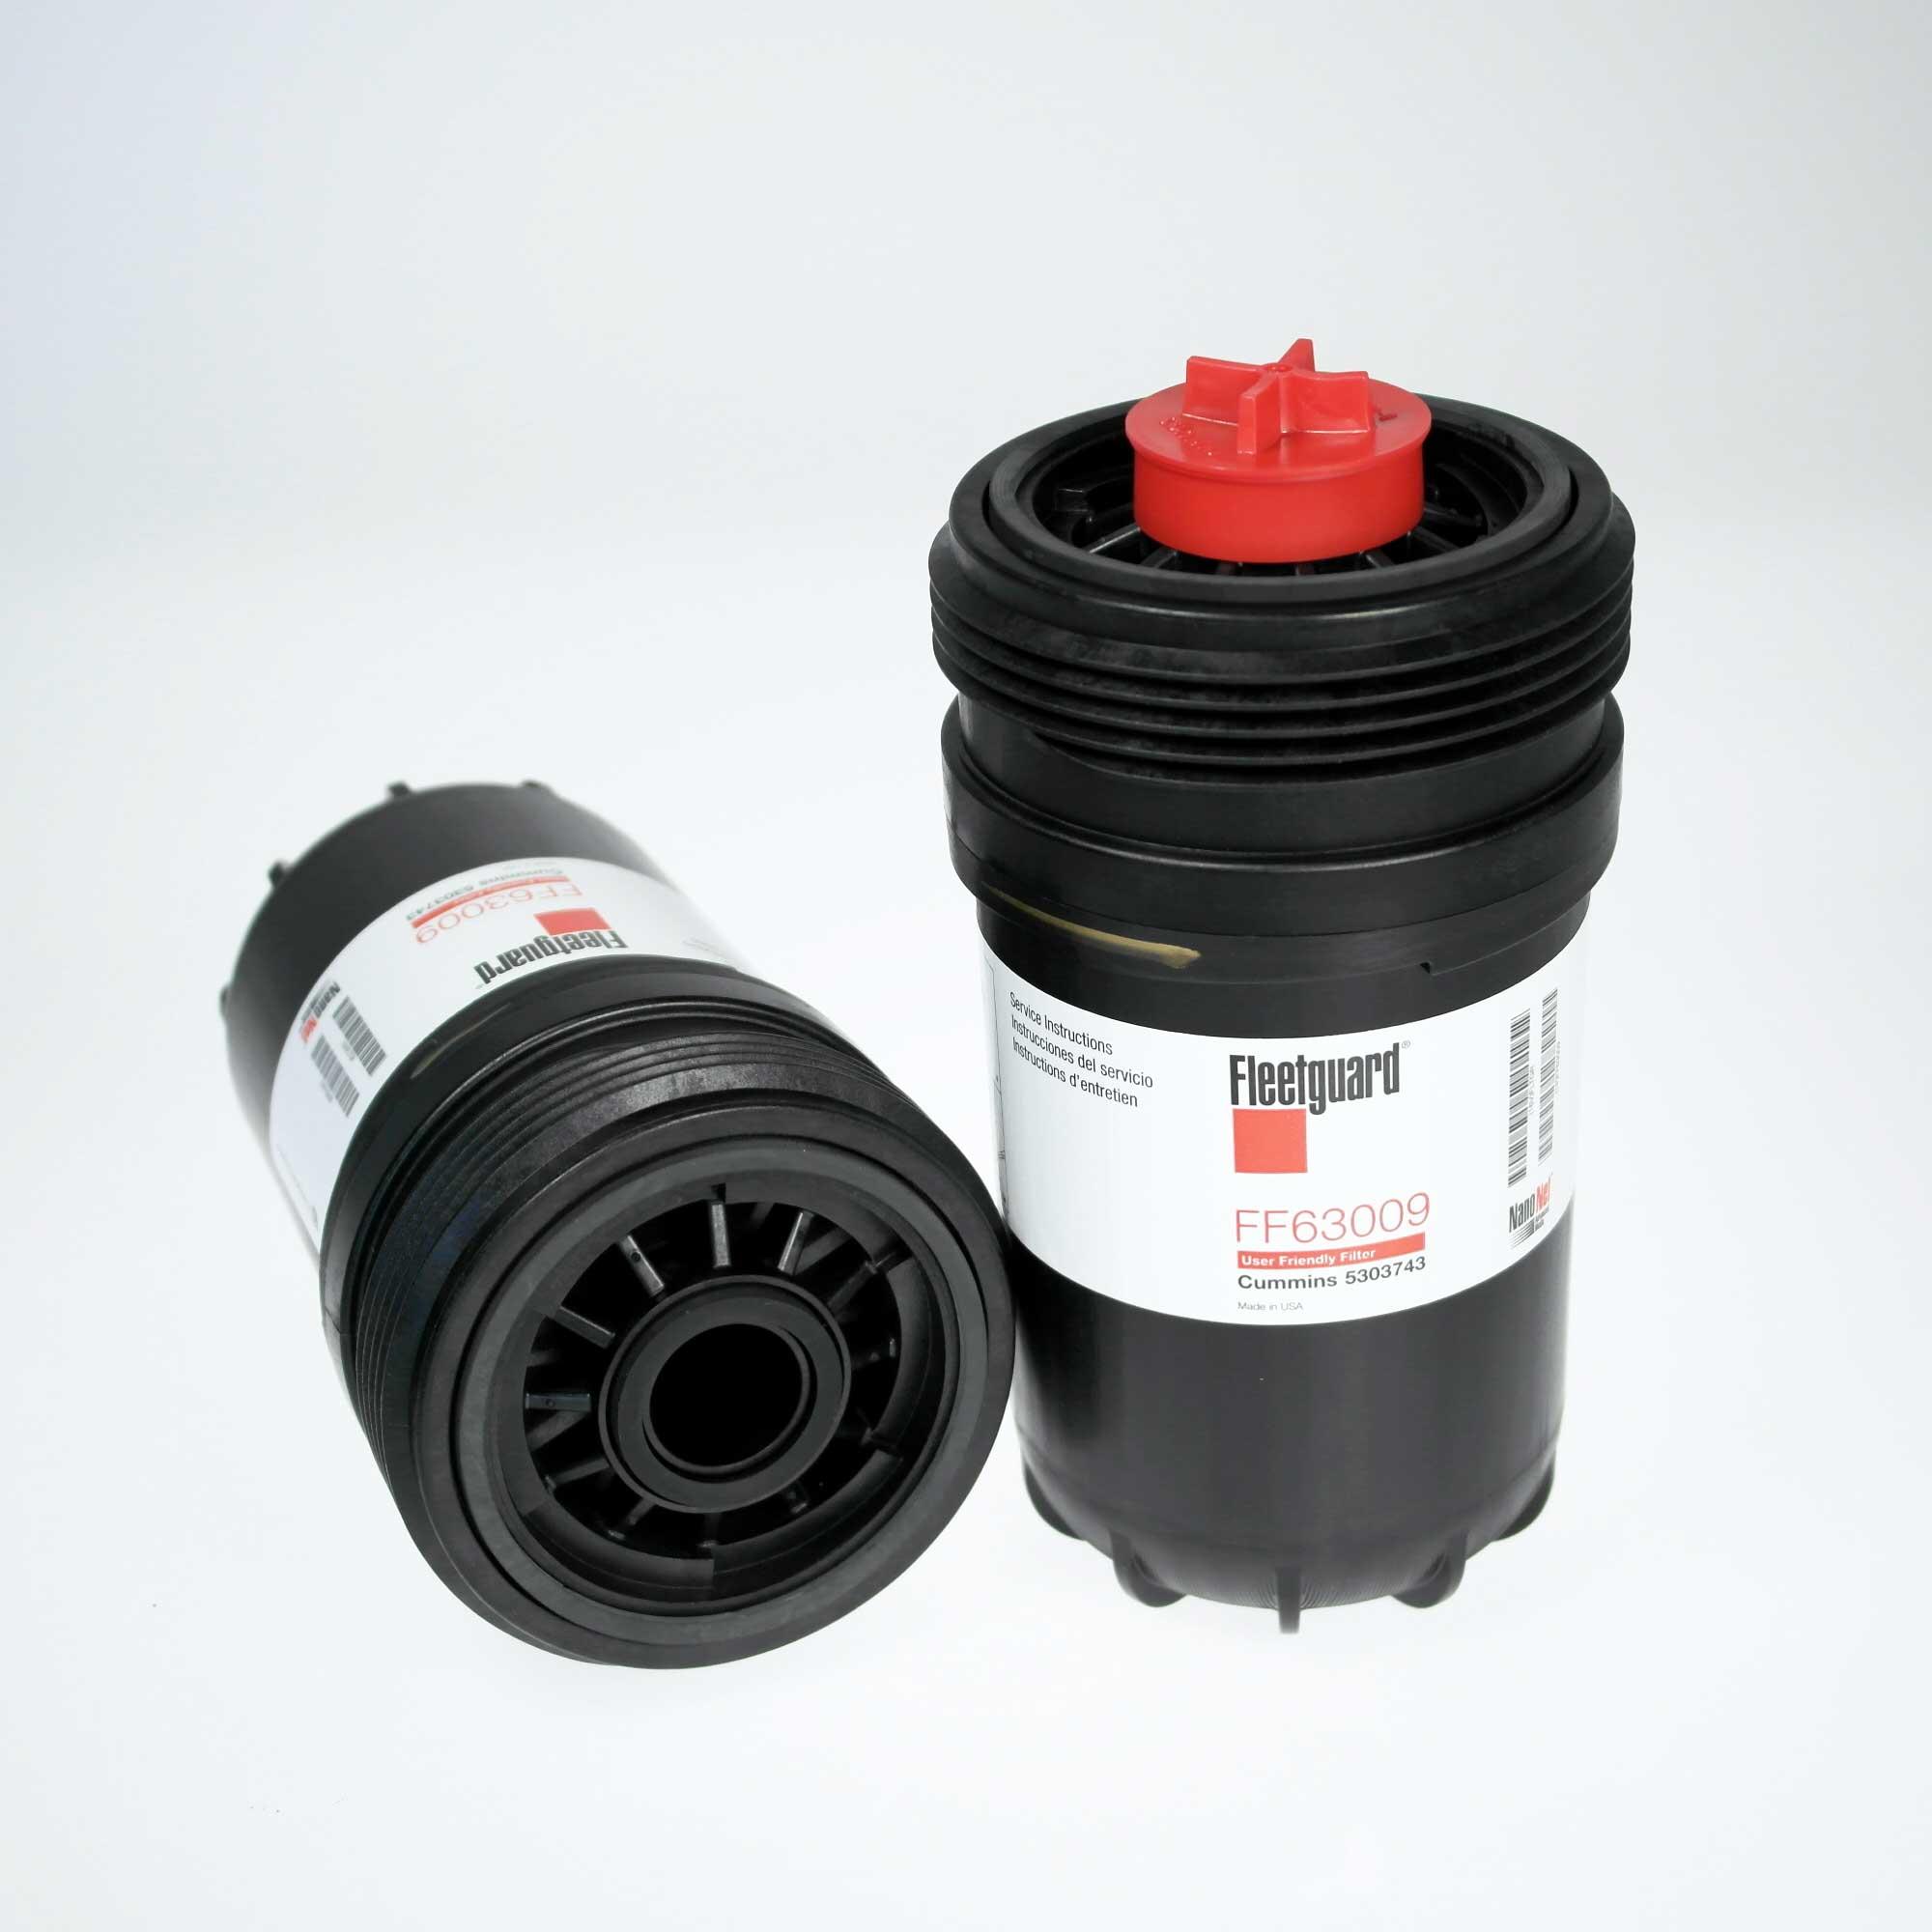 Brennstoffilter, varenummer FF63009